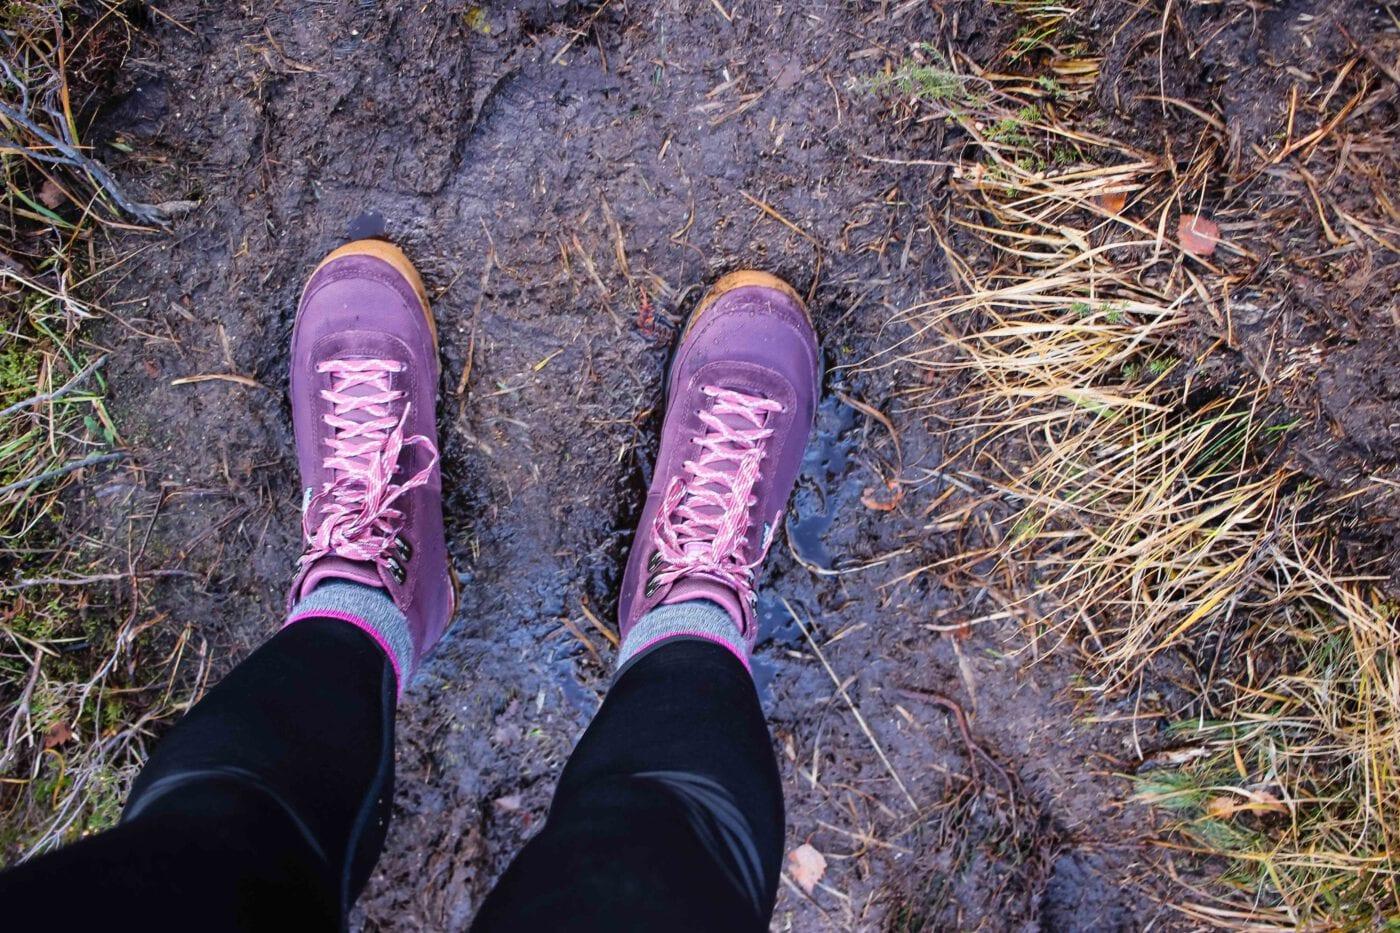 Wandern in Schottland - Mein Wanderurlaub